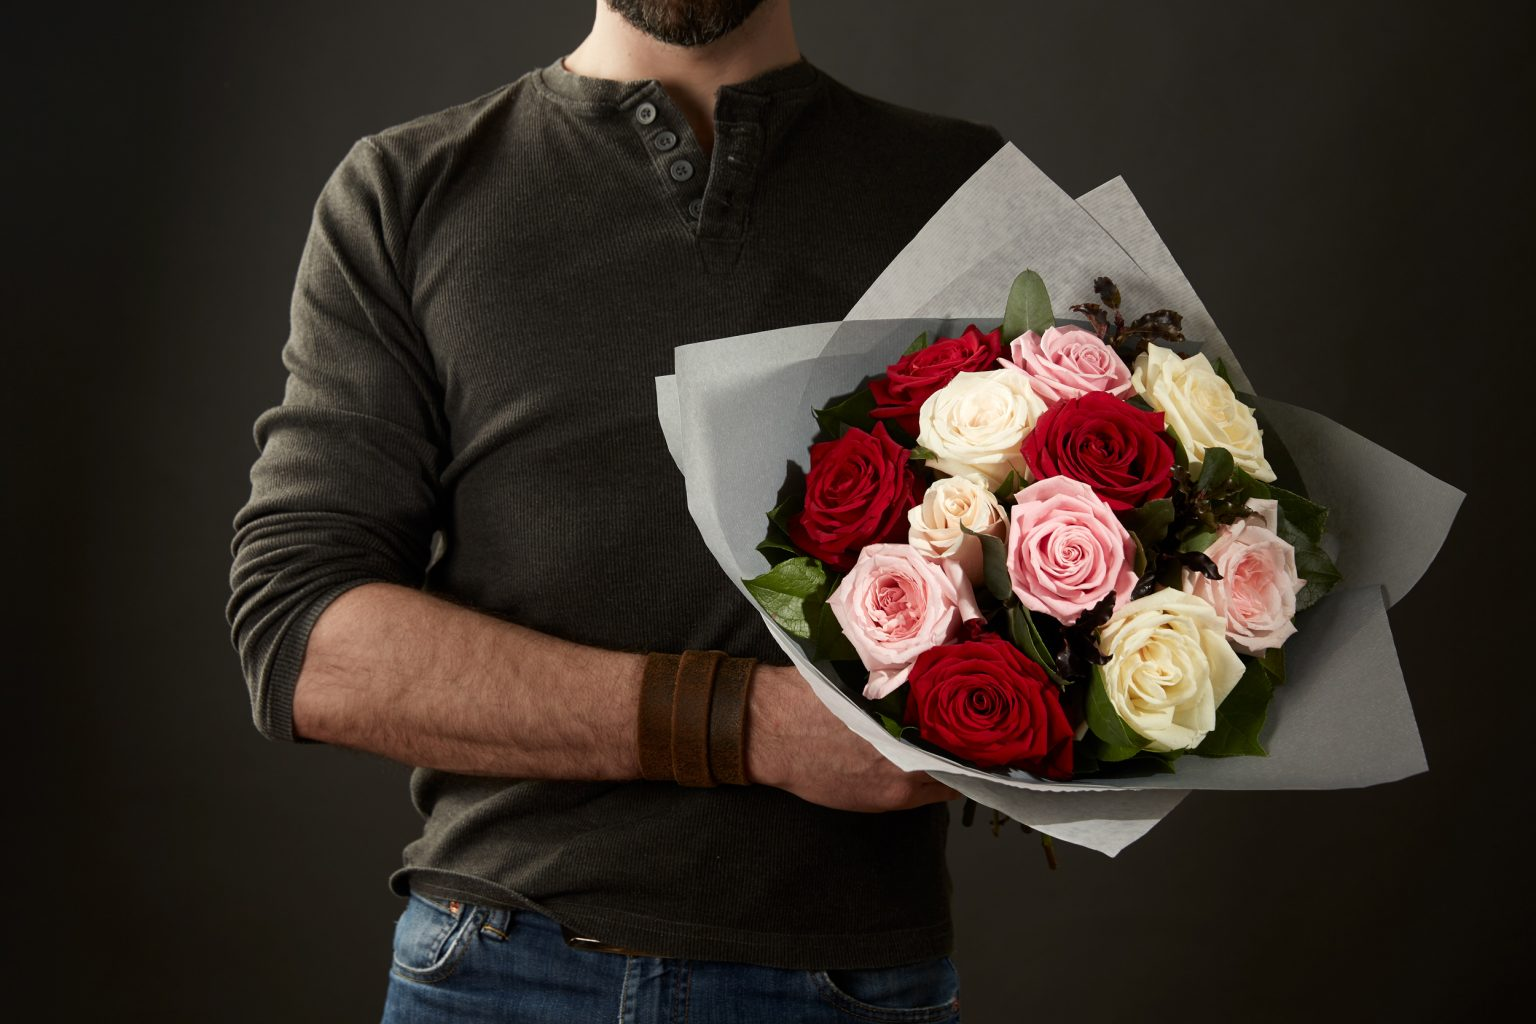 Adonis flowers adonis flower designers patrick street dublin 8 select options izmirmasajfo